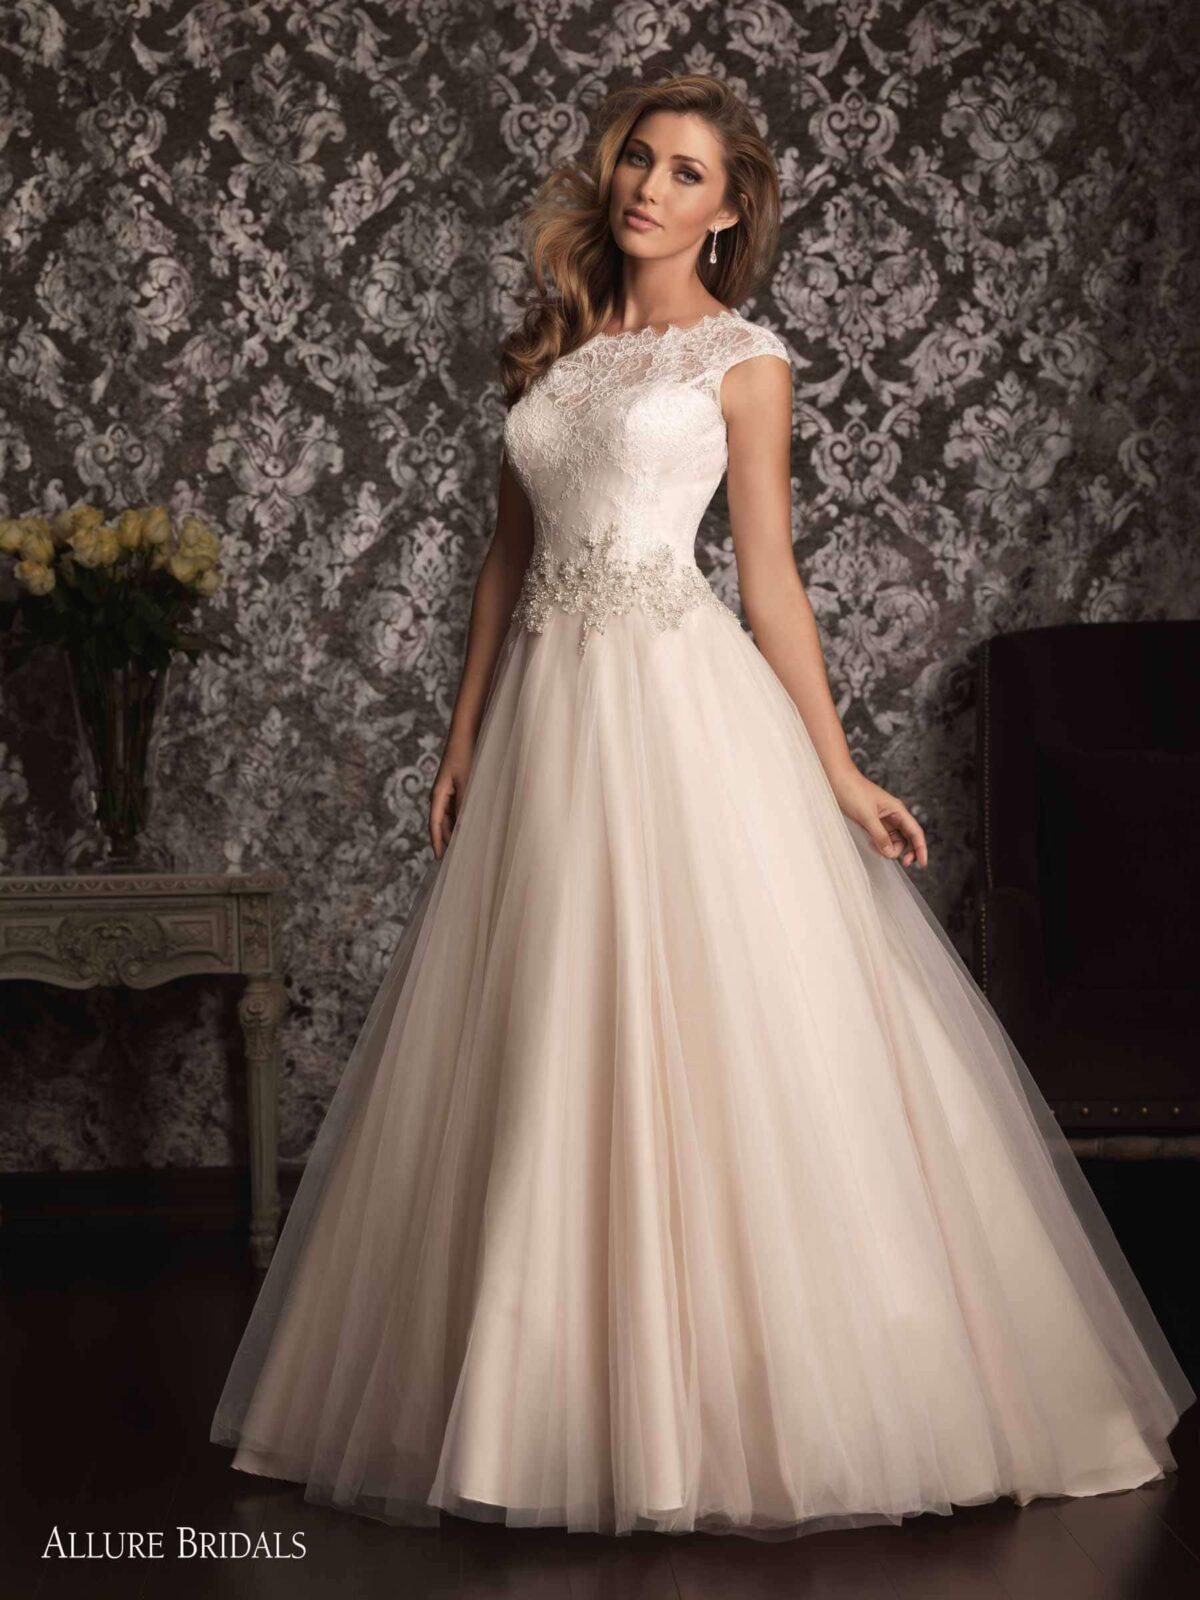 Allure Wedding Dresses.Allure Bridal 9022